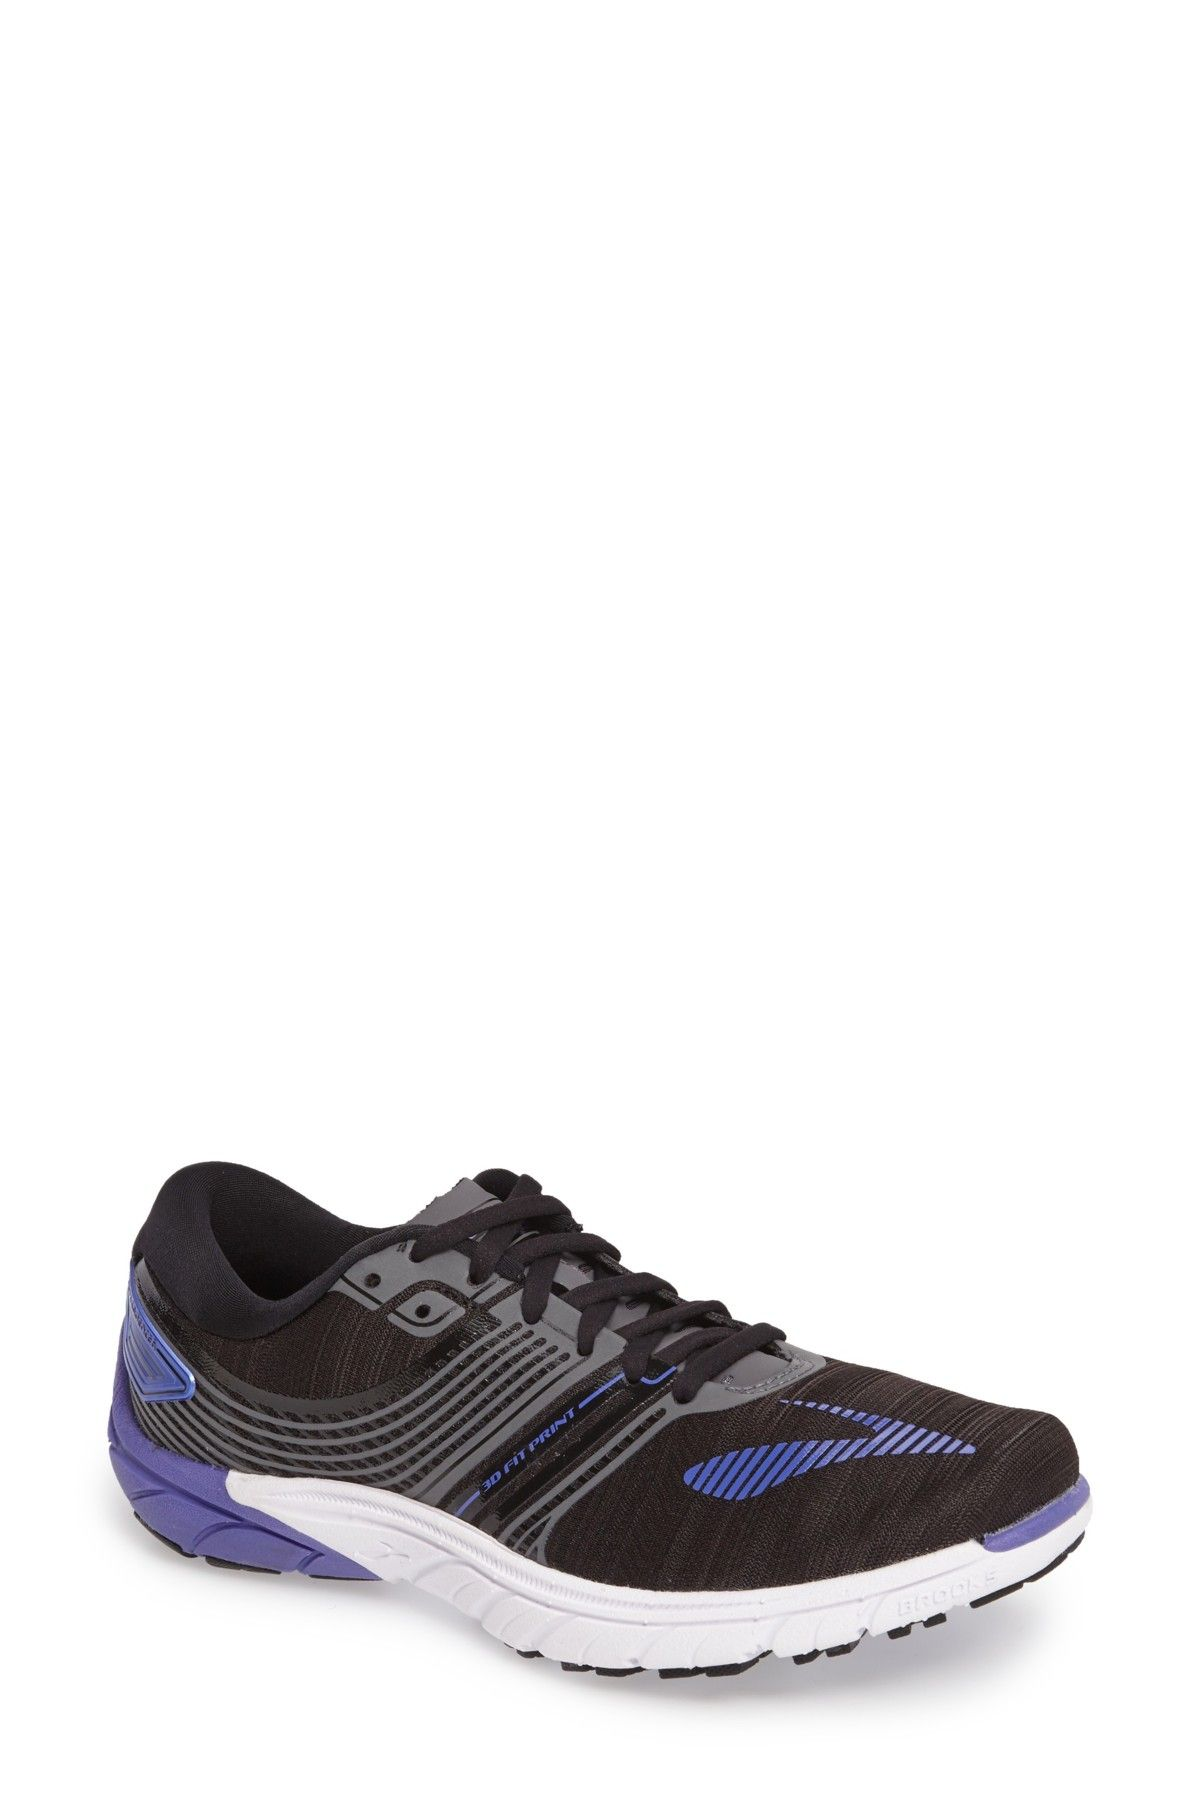 Brooks PureCadence 6 Running Shoe